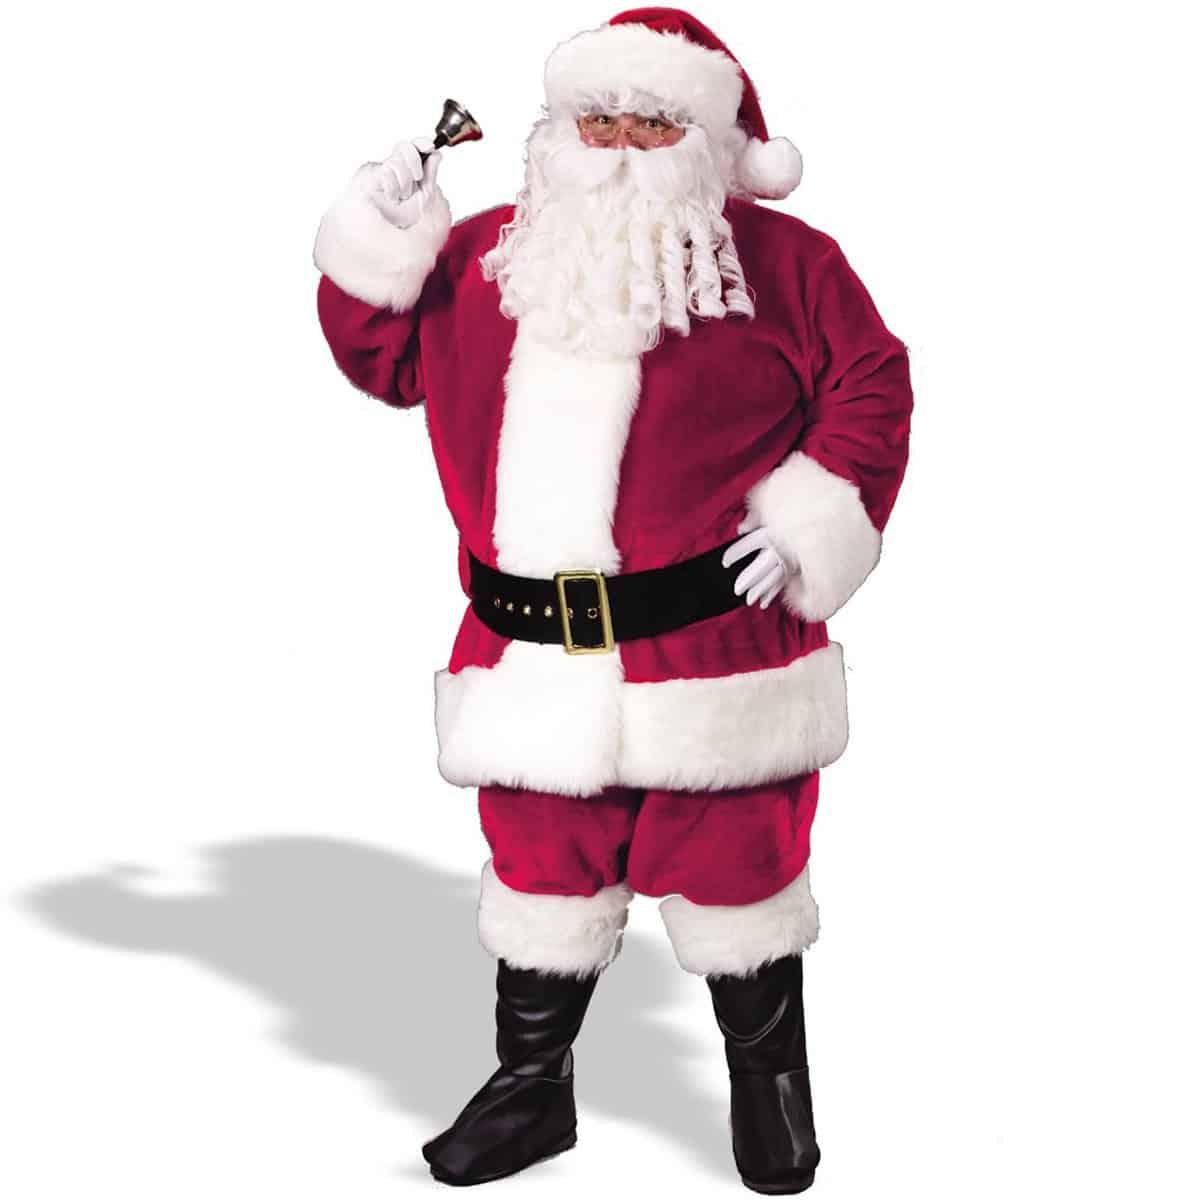 Santa claus pics 0103